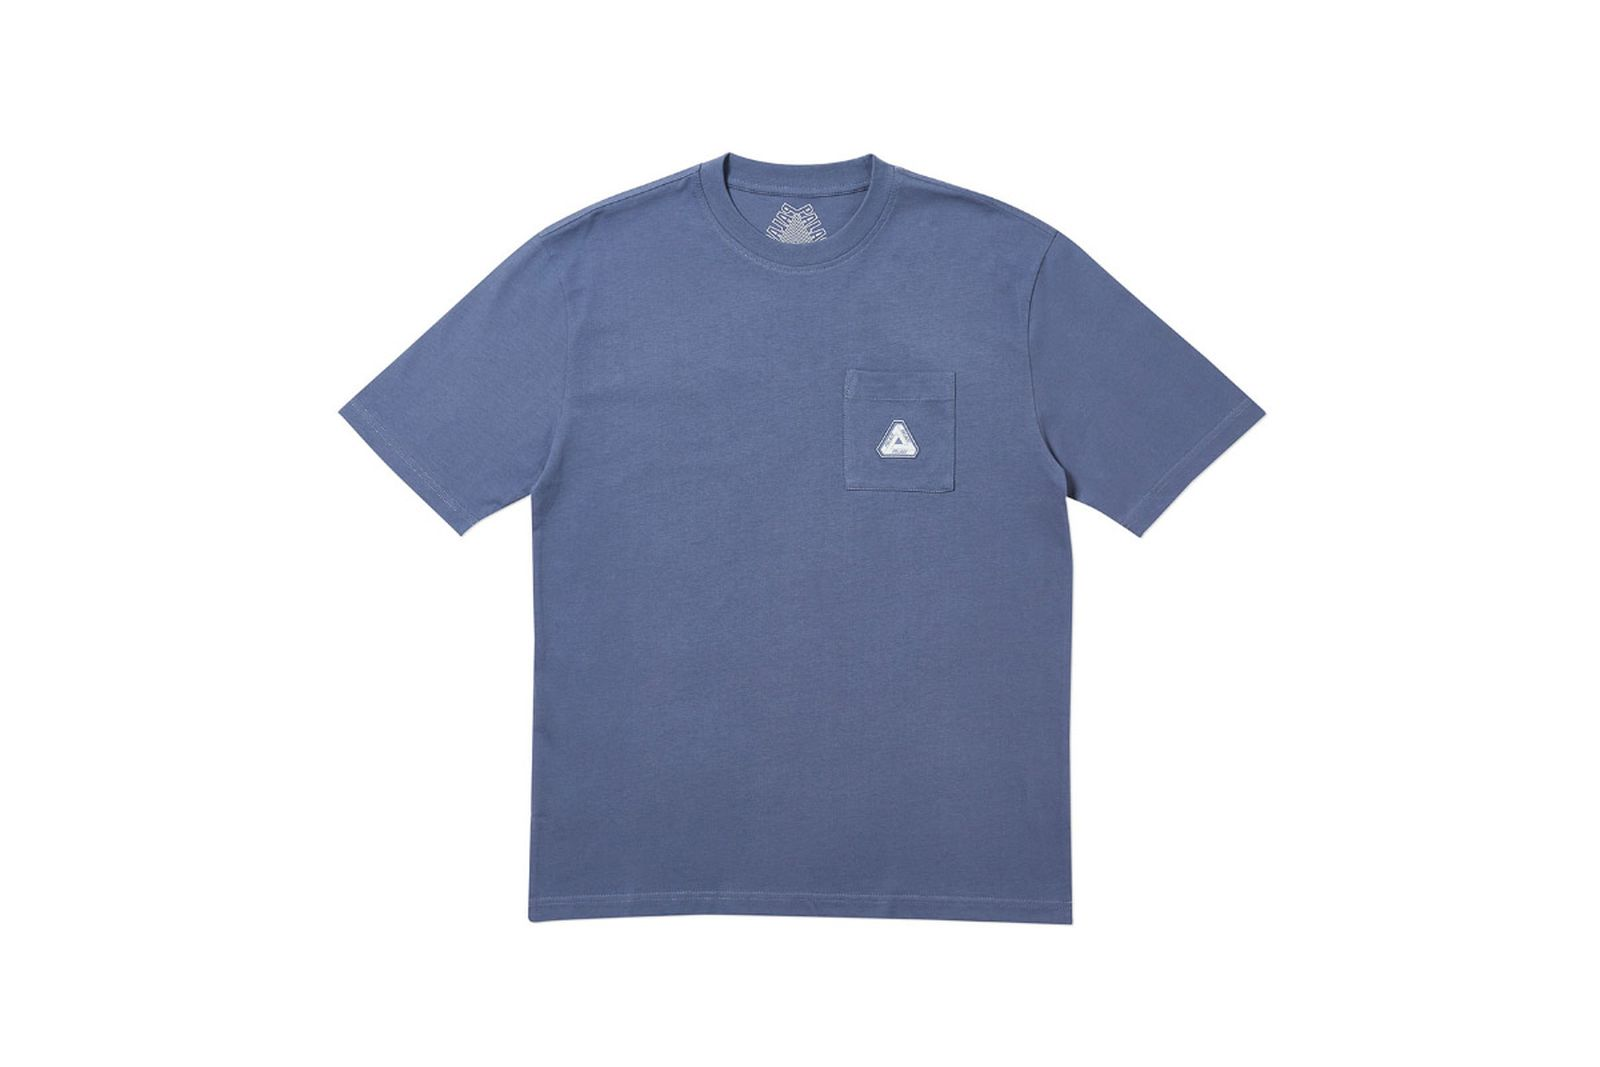 Palace 2019 Autumn T Shirt Pocket blue